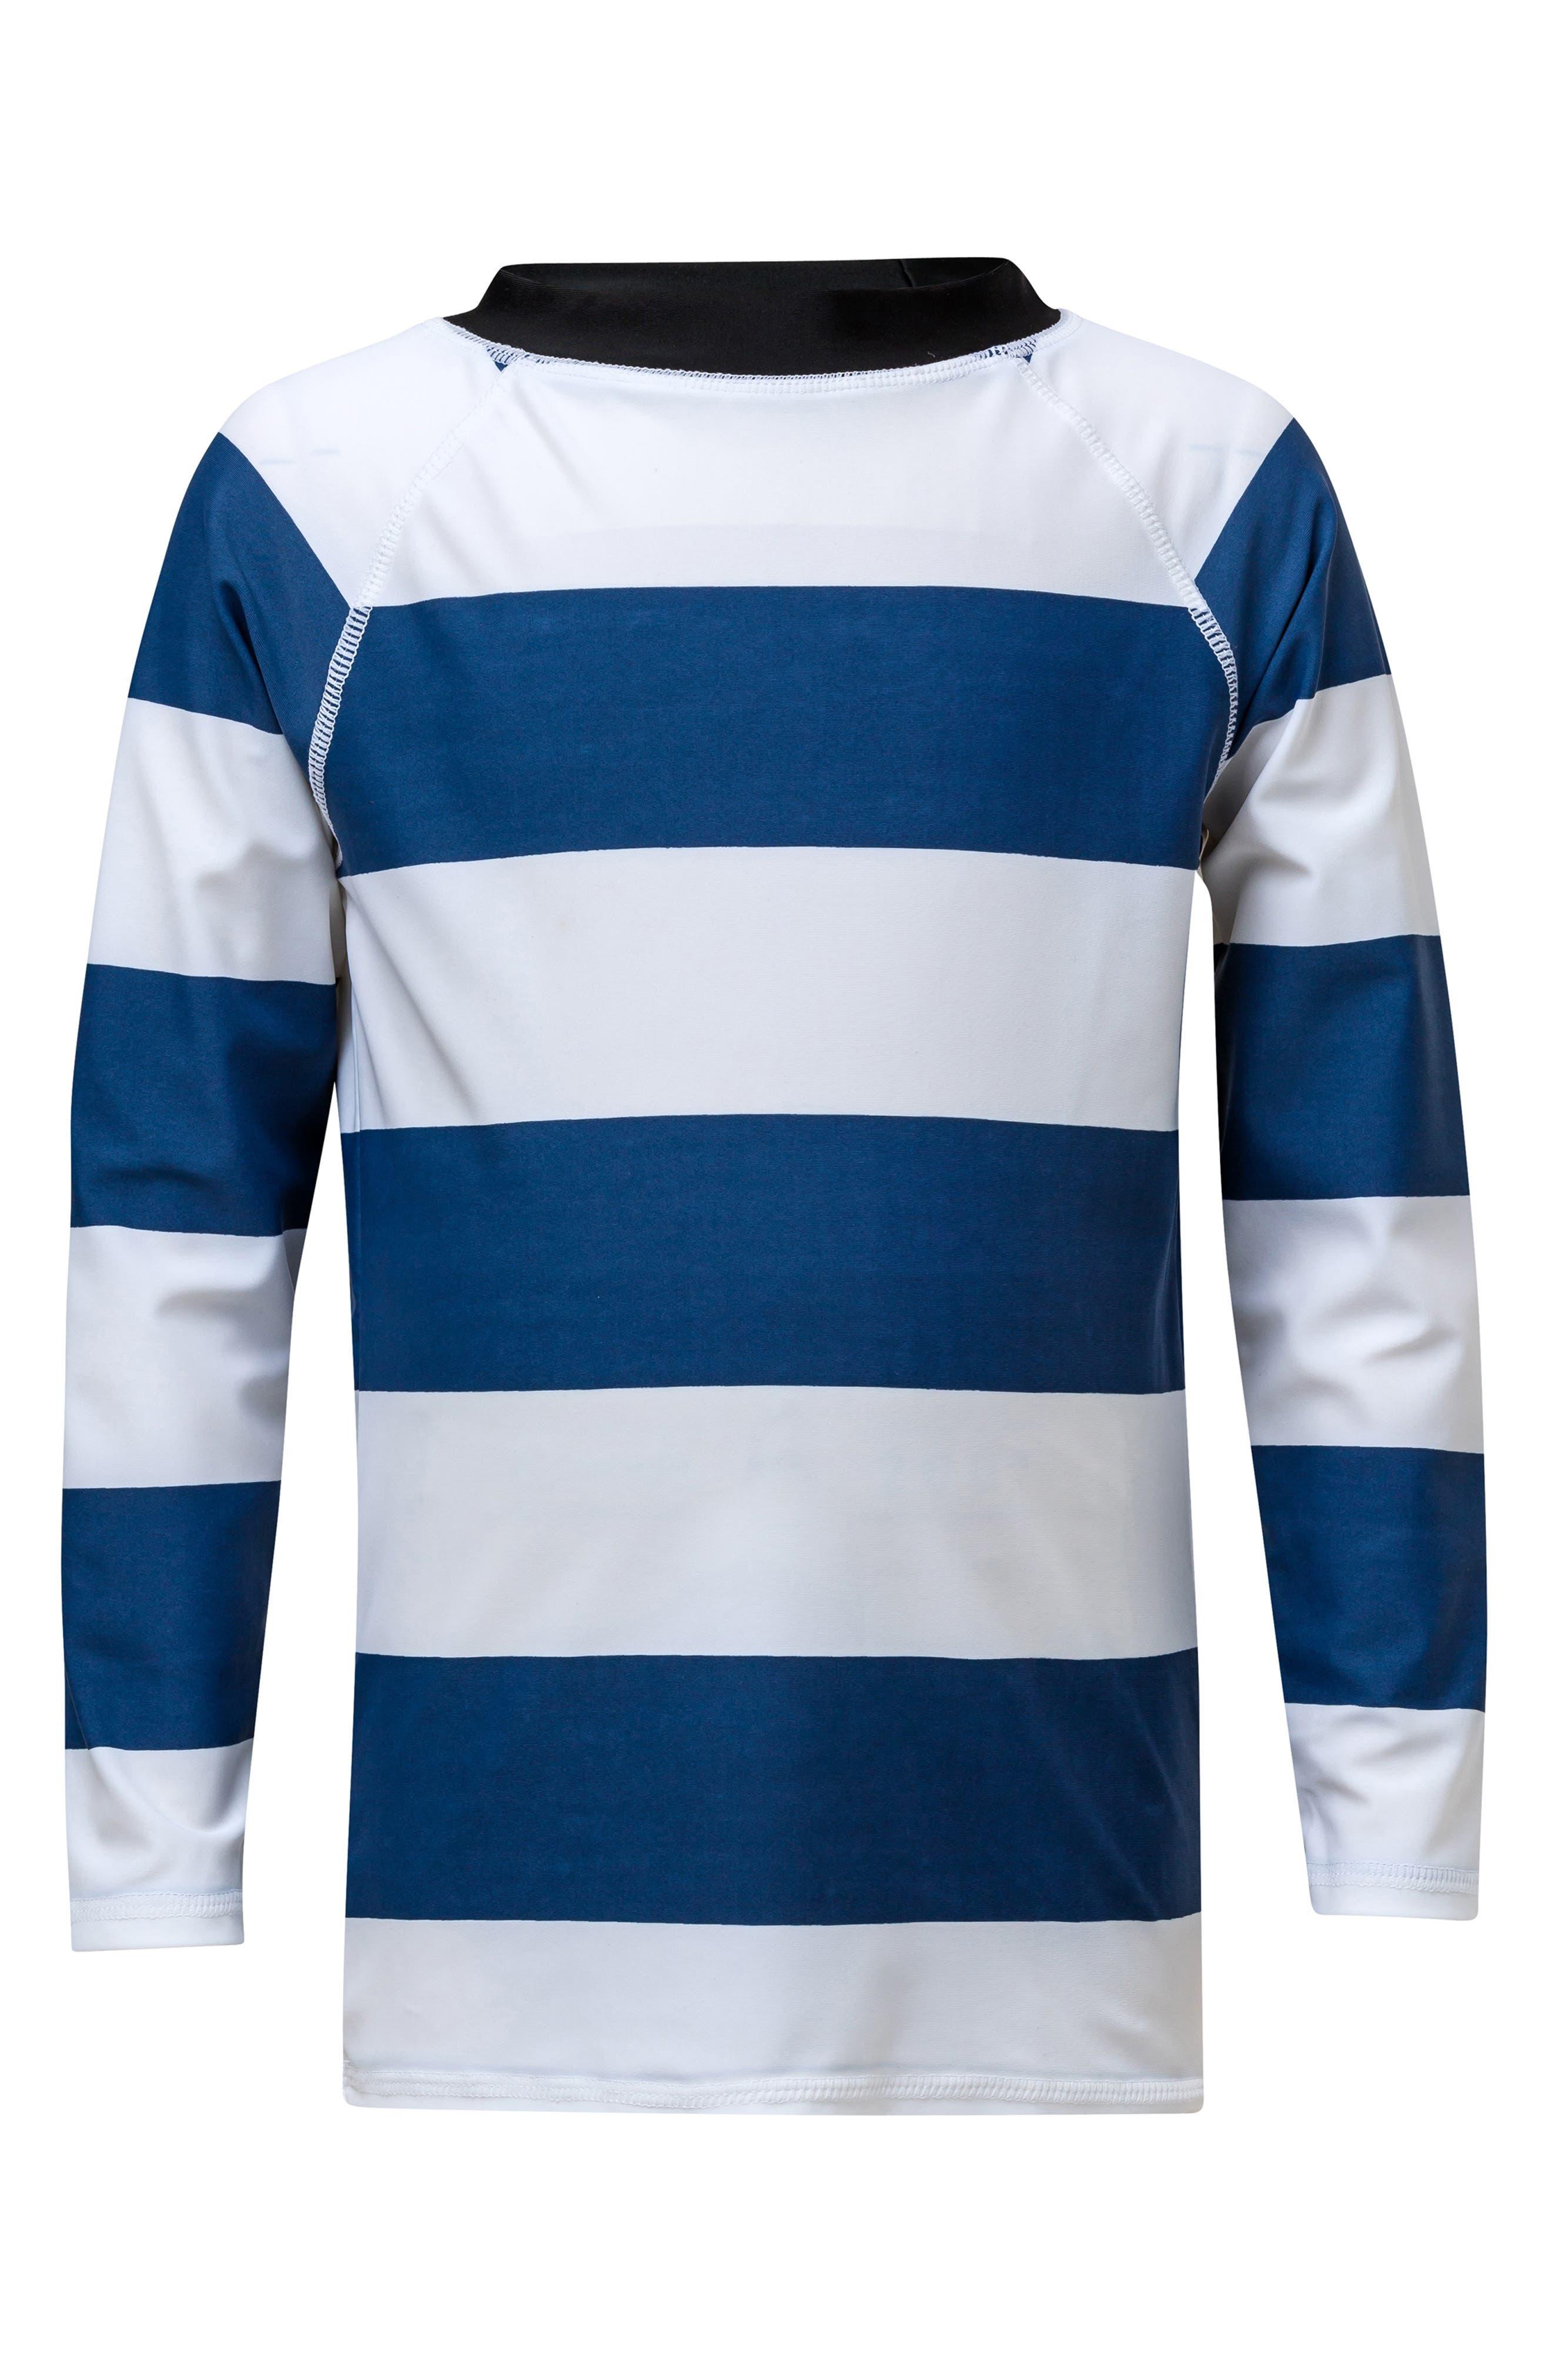 Rugby Stripe Rashguard,                         Main,                         color, DENIM BLUE WHITE